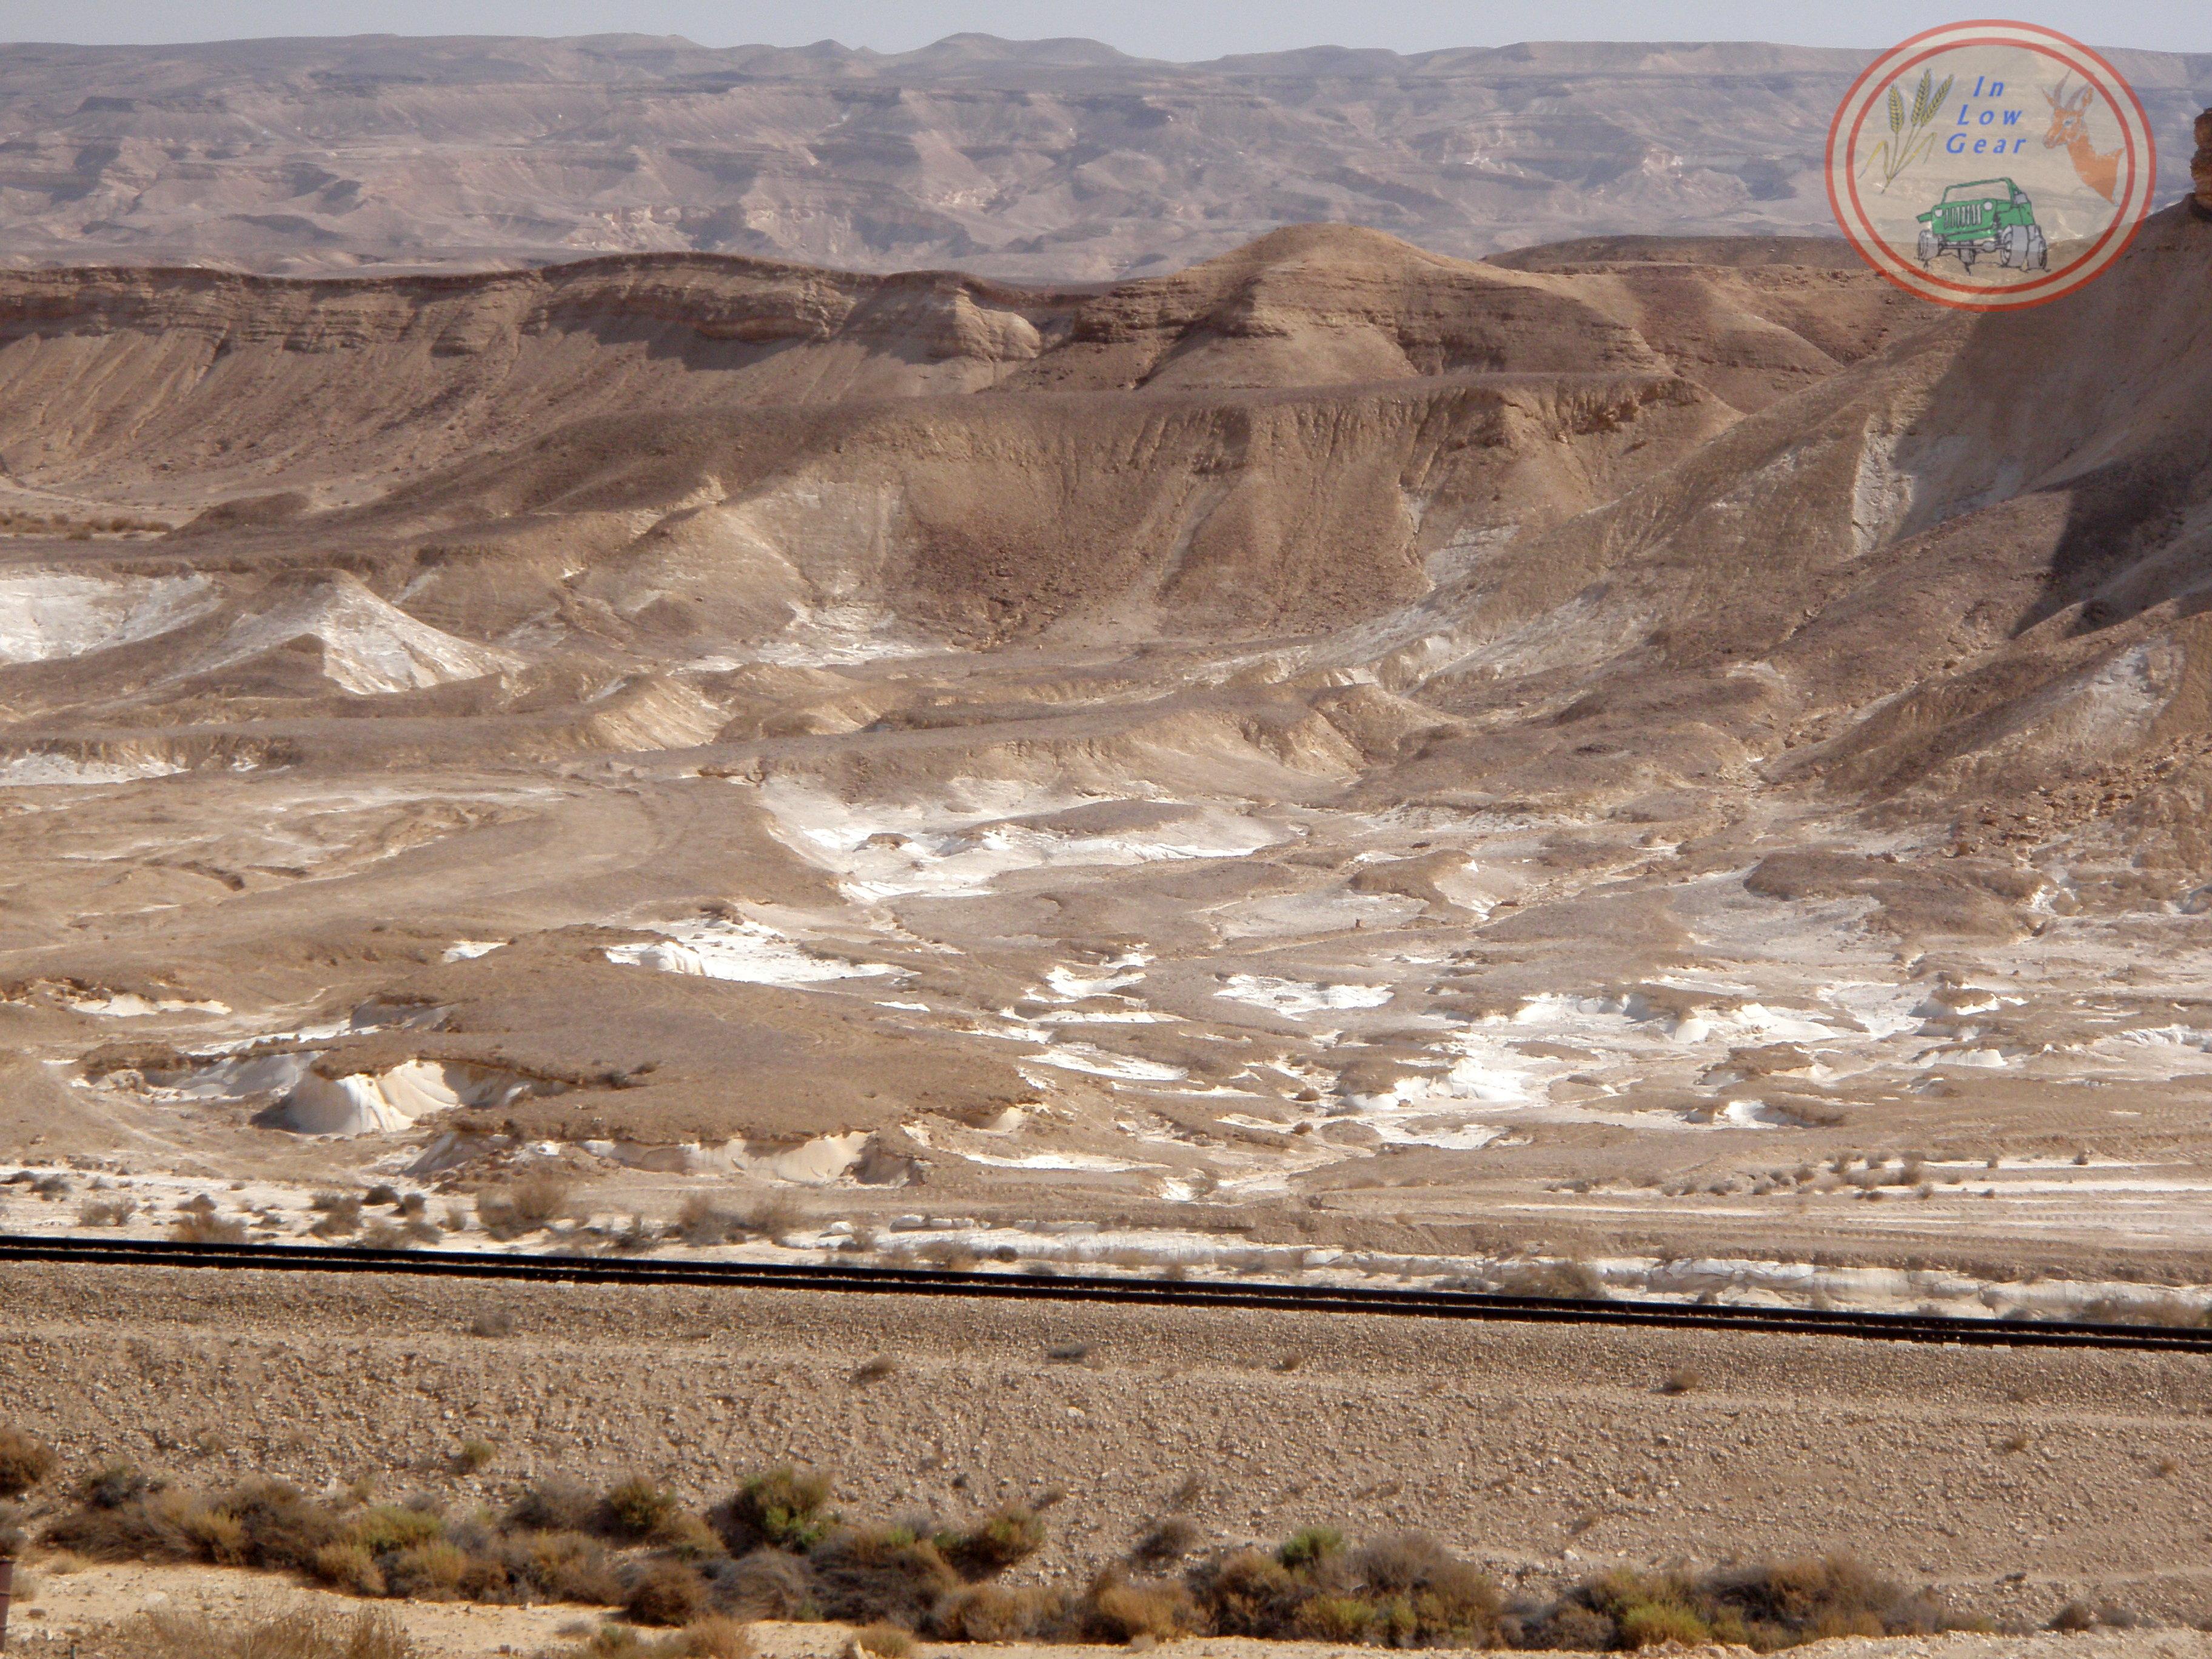 Phosphate land Nahal Zin ארץ הפוספט בנחל צין